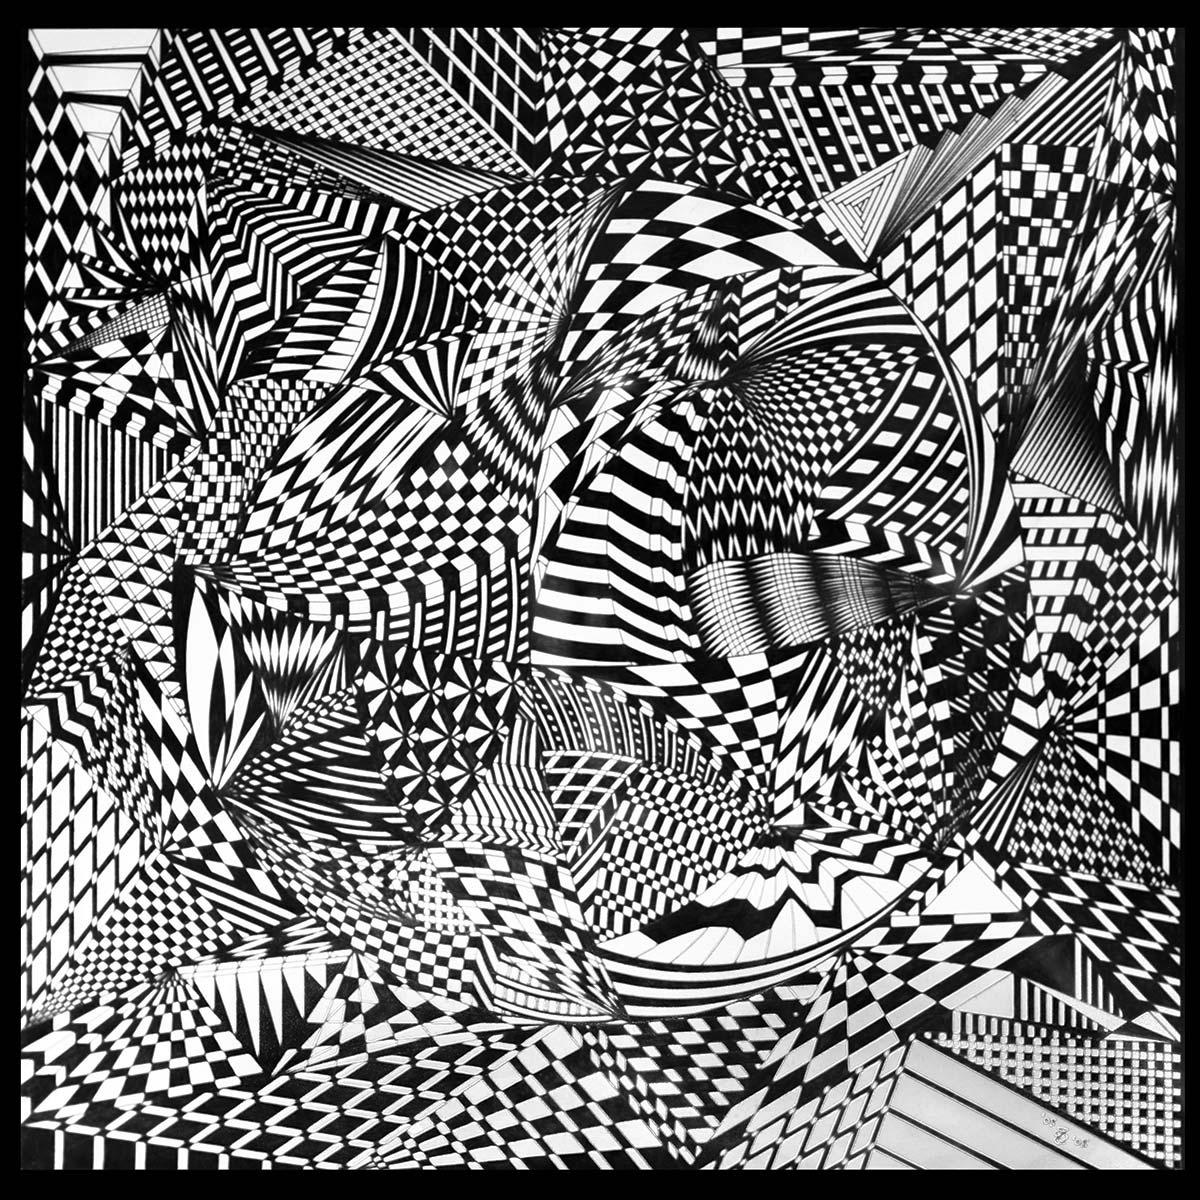 Sphere Graphics / Illustration Jigsaw Puzzle